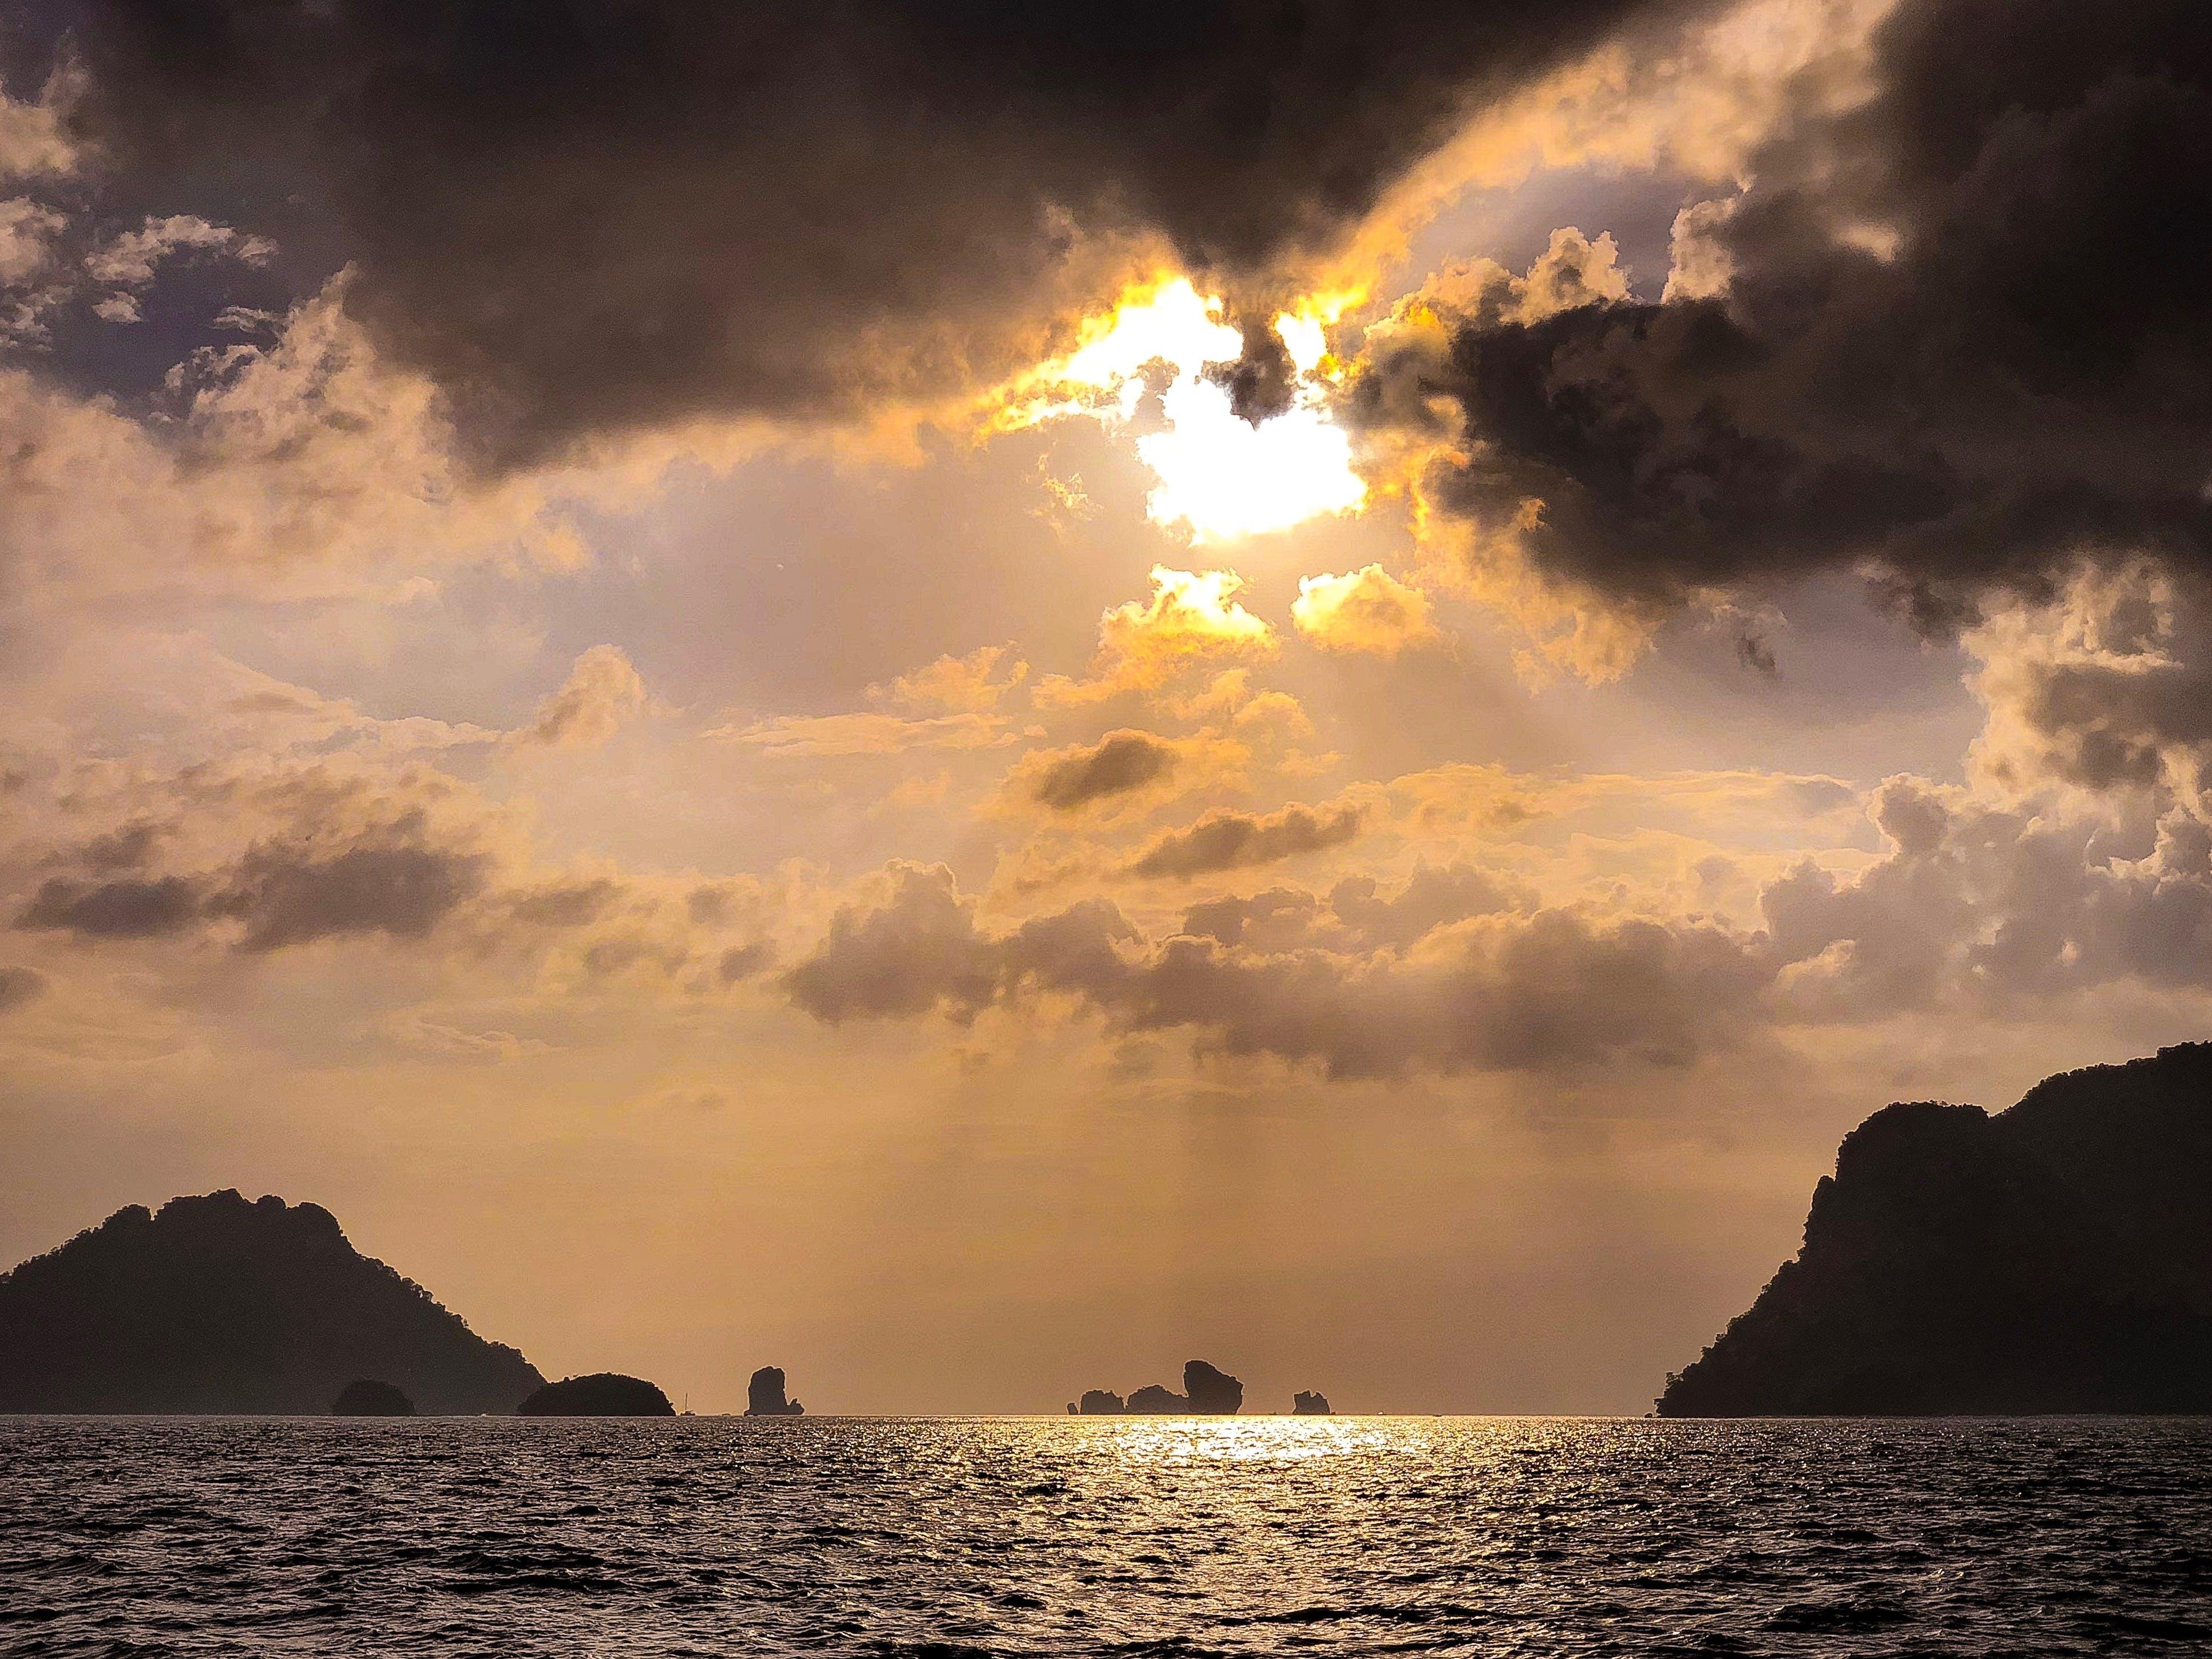 Kostenloses Stock Foto zu abend, berge, himmel, inseln